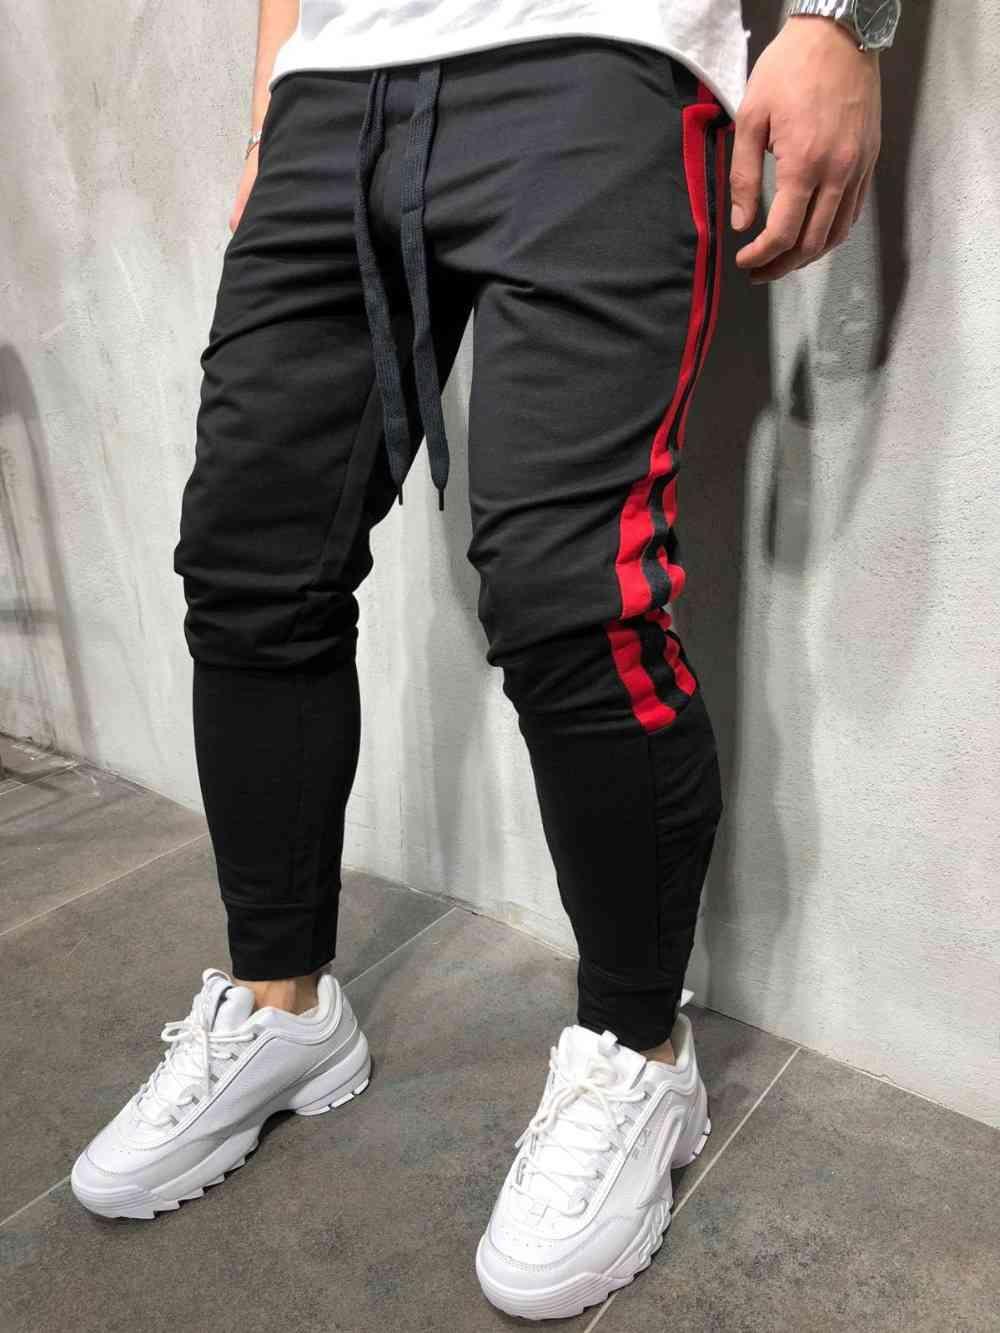 Hombre Gimnasio Culturismo Moda Hip Hop Street Pantalones Casuales Pantalones Rayados Pantalones Hombre Jogger Pantalones Hombres